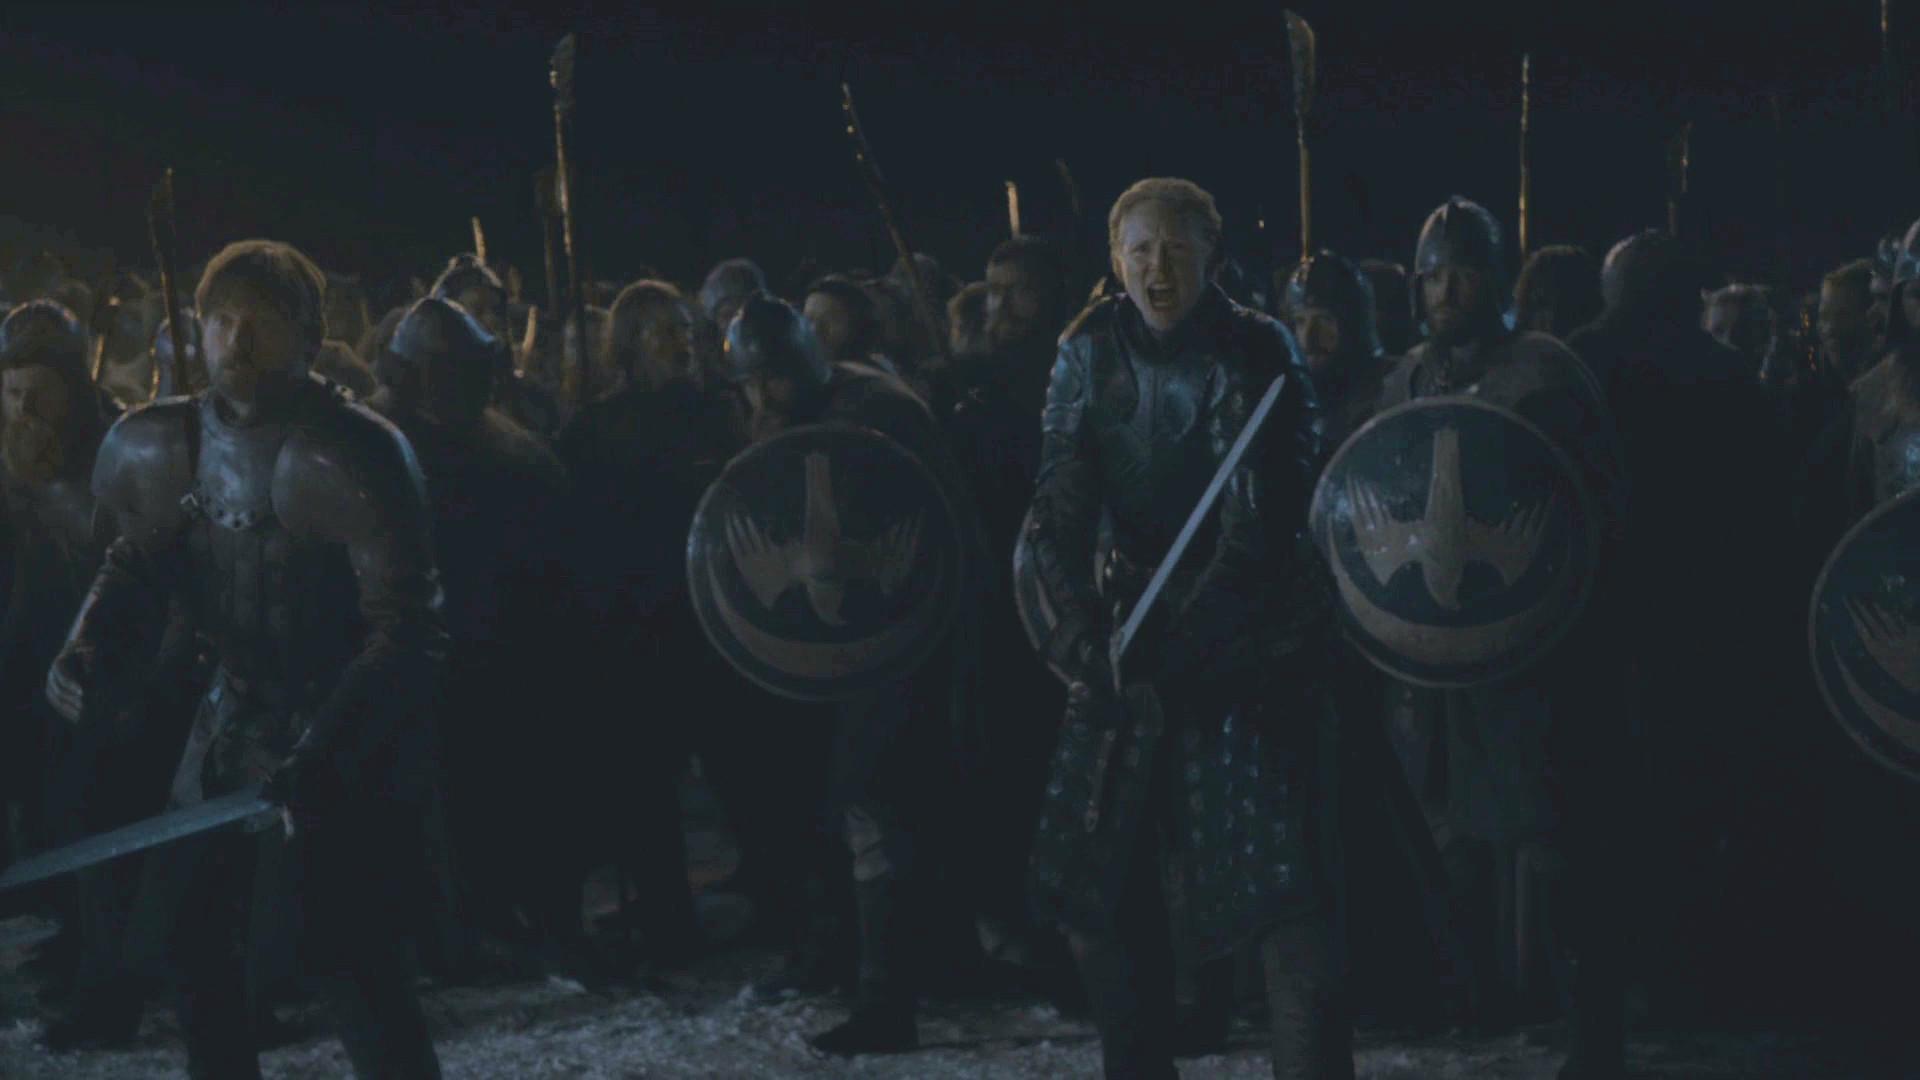 Brienne-of-Tarth-Jaime-Season8 Episode 3